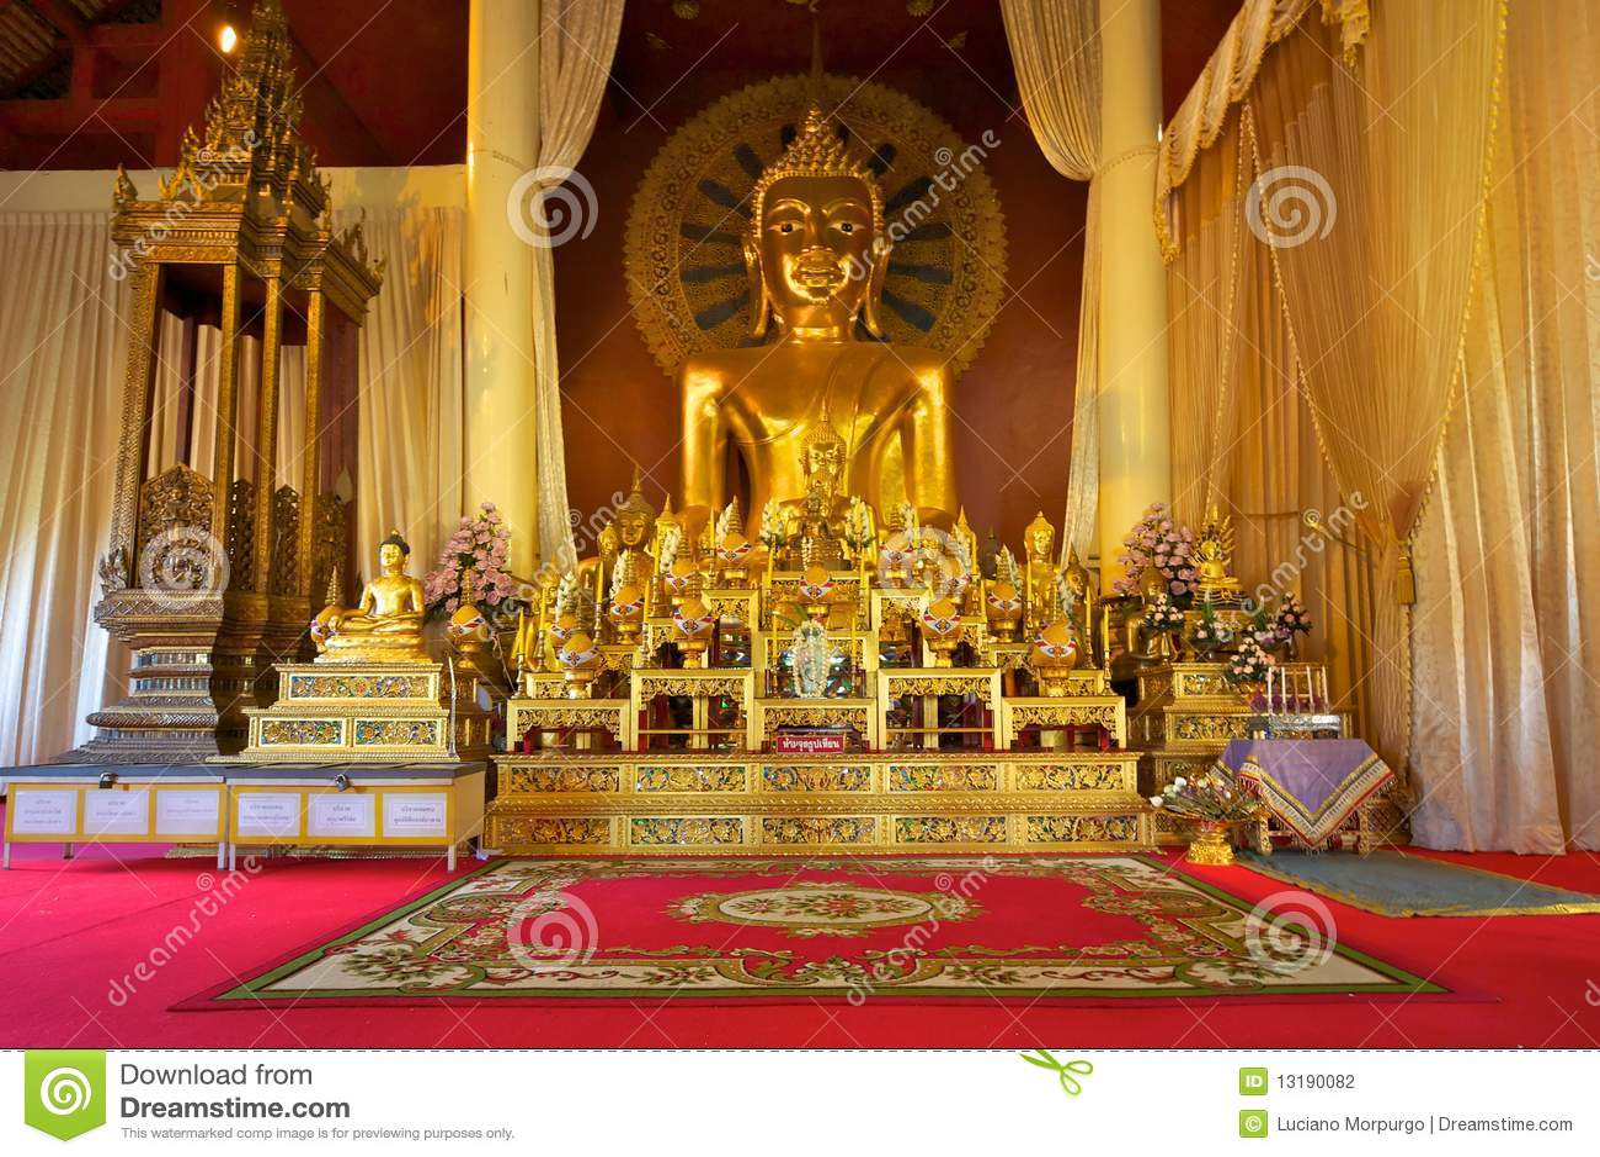 Buddha Statue In Wat Phra Singh Temple, Chiang Mai Stock ...